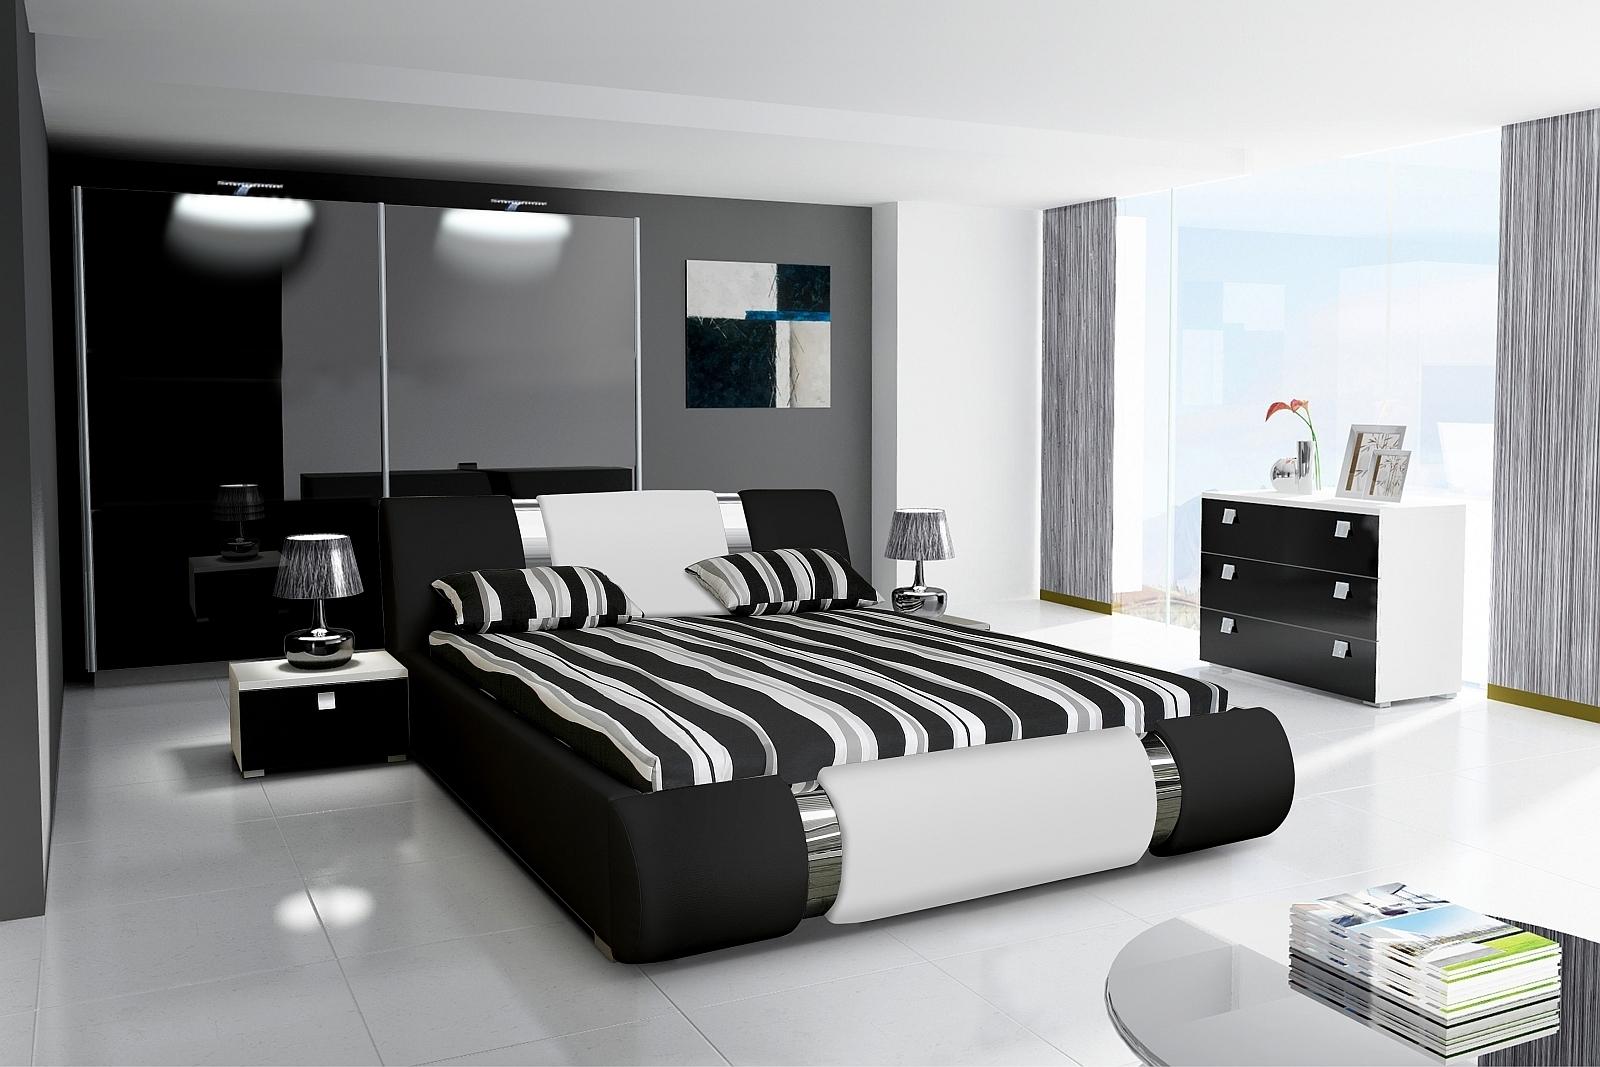 Schlafzimmer Mit Boxspringbett Komplett